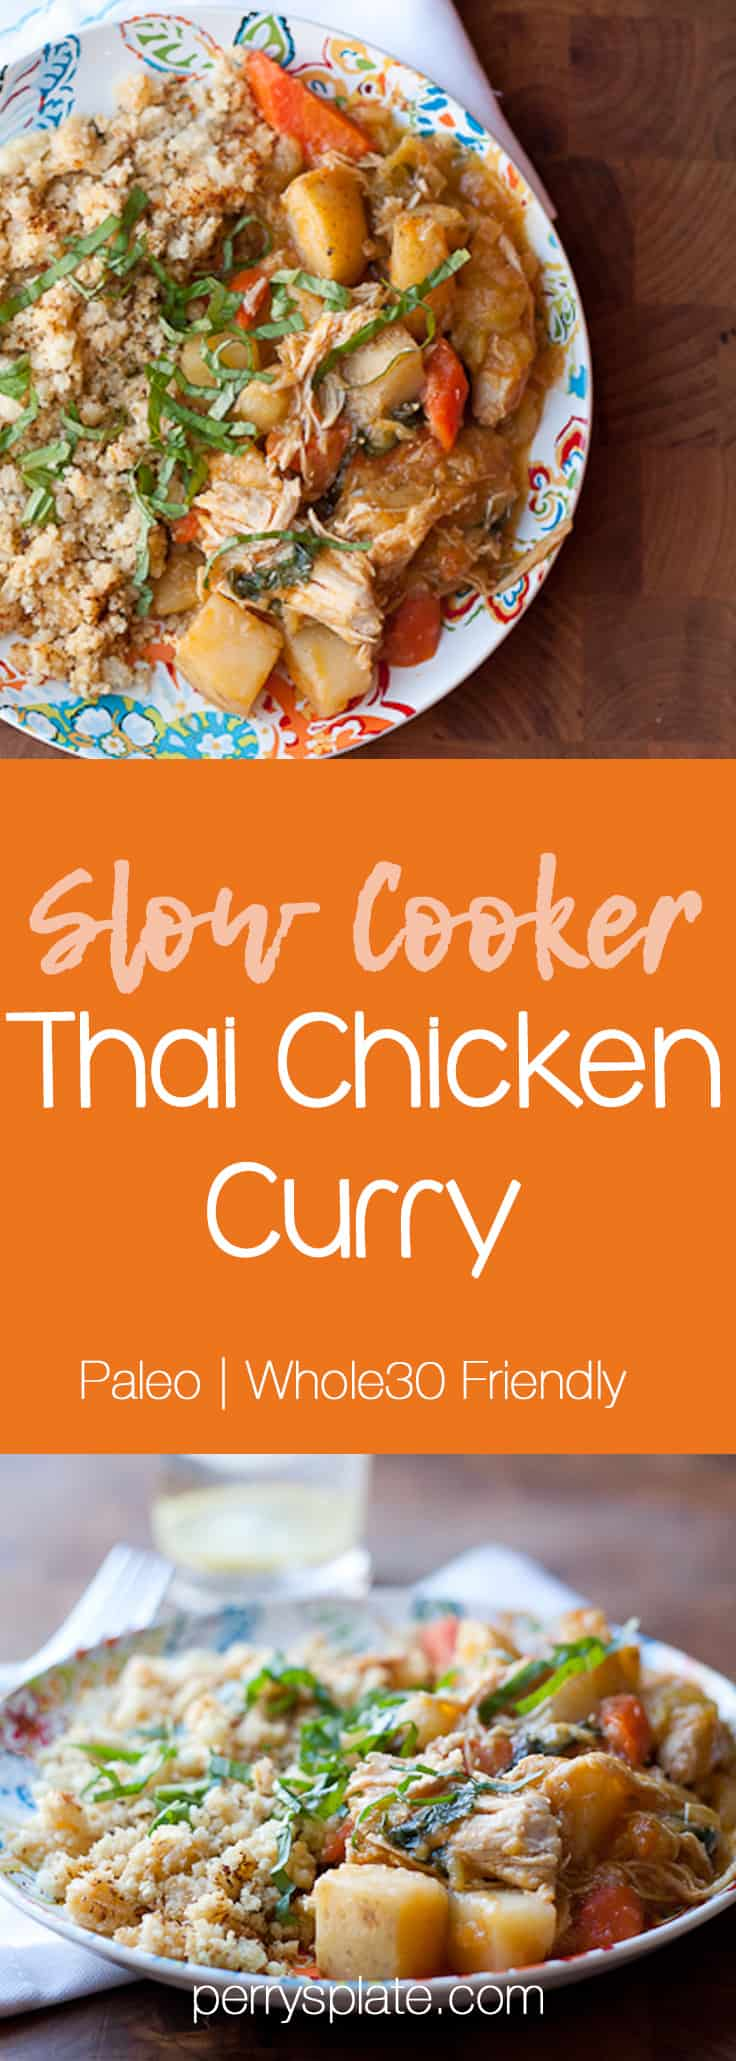 Slow Cooker Thai Chicken Curry | paleo recipes | Whole30 recipes | crock pot recipes | gluten-free recipes | Thai recipes | perrysplate.com